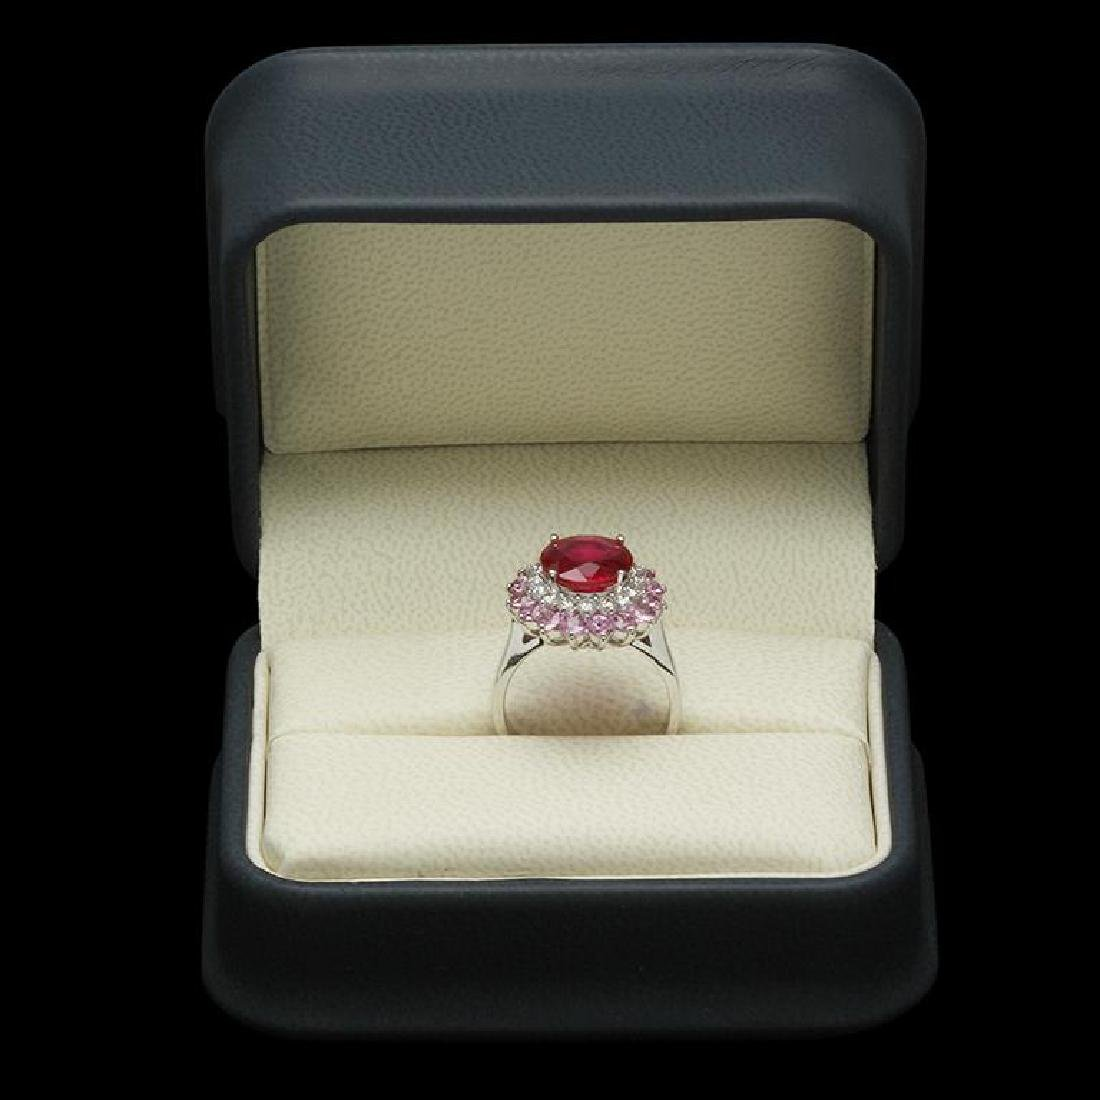 14K 2.78ct Ruby, 2.08ct Pink Sapphire, 0.61ct Diamond - 3